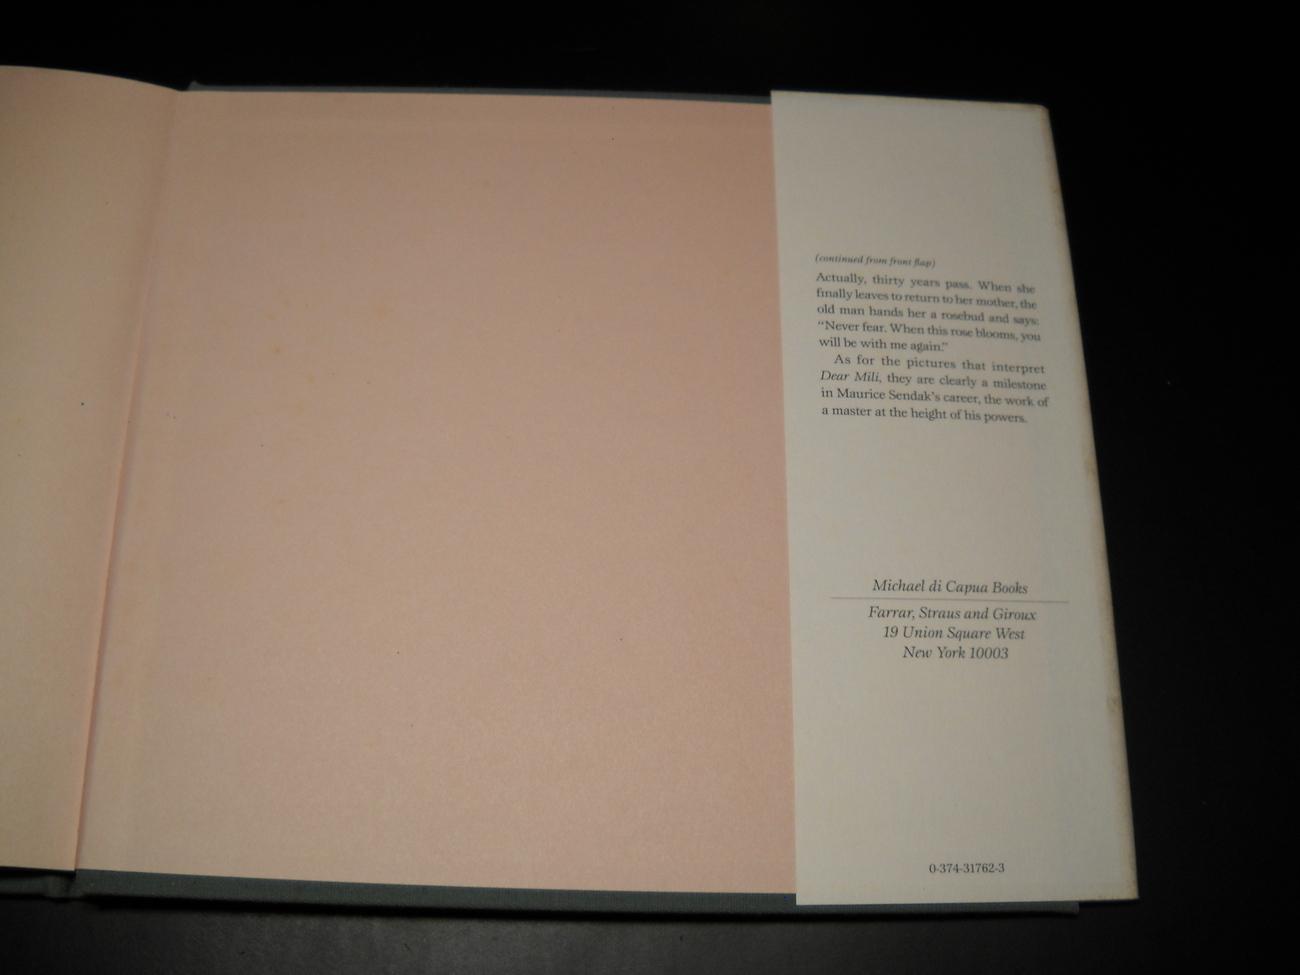 Dear Mili Wilhelm Grimm Maurice Sendak First Edition 1988 Hard Cover Dust Jacket